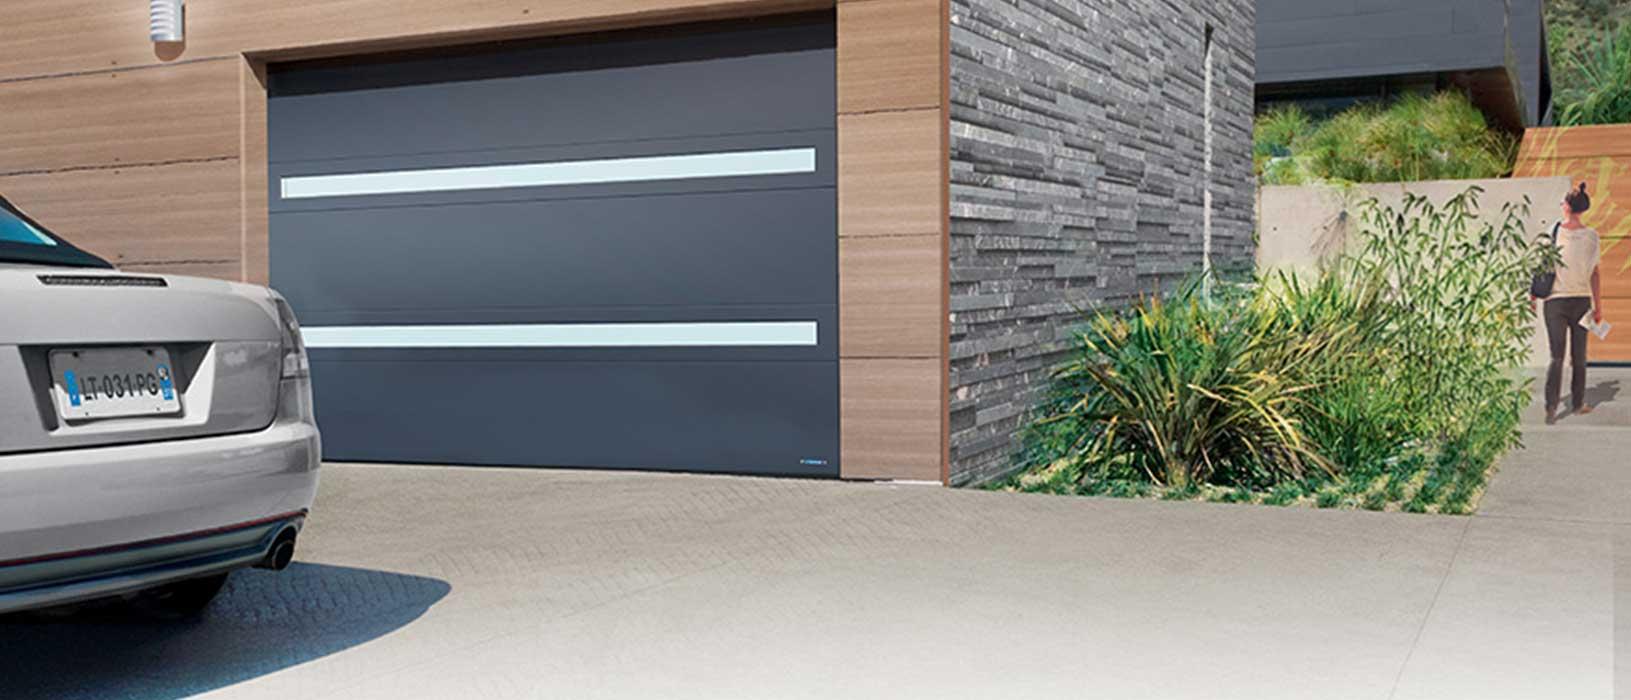 portes de garage basculante habitat moderne fermetures protections lyonnaises. Black Bedroom Furniture Sets. Home Design Ideas